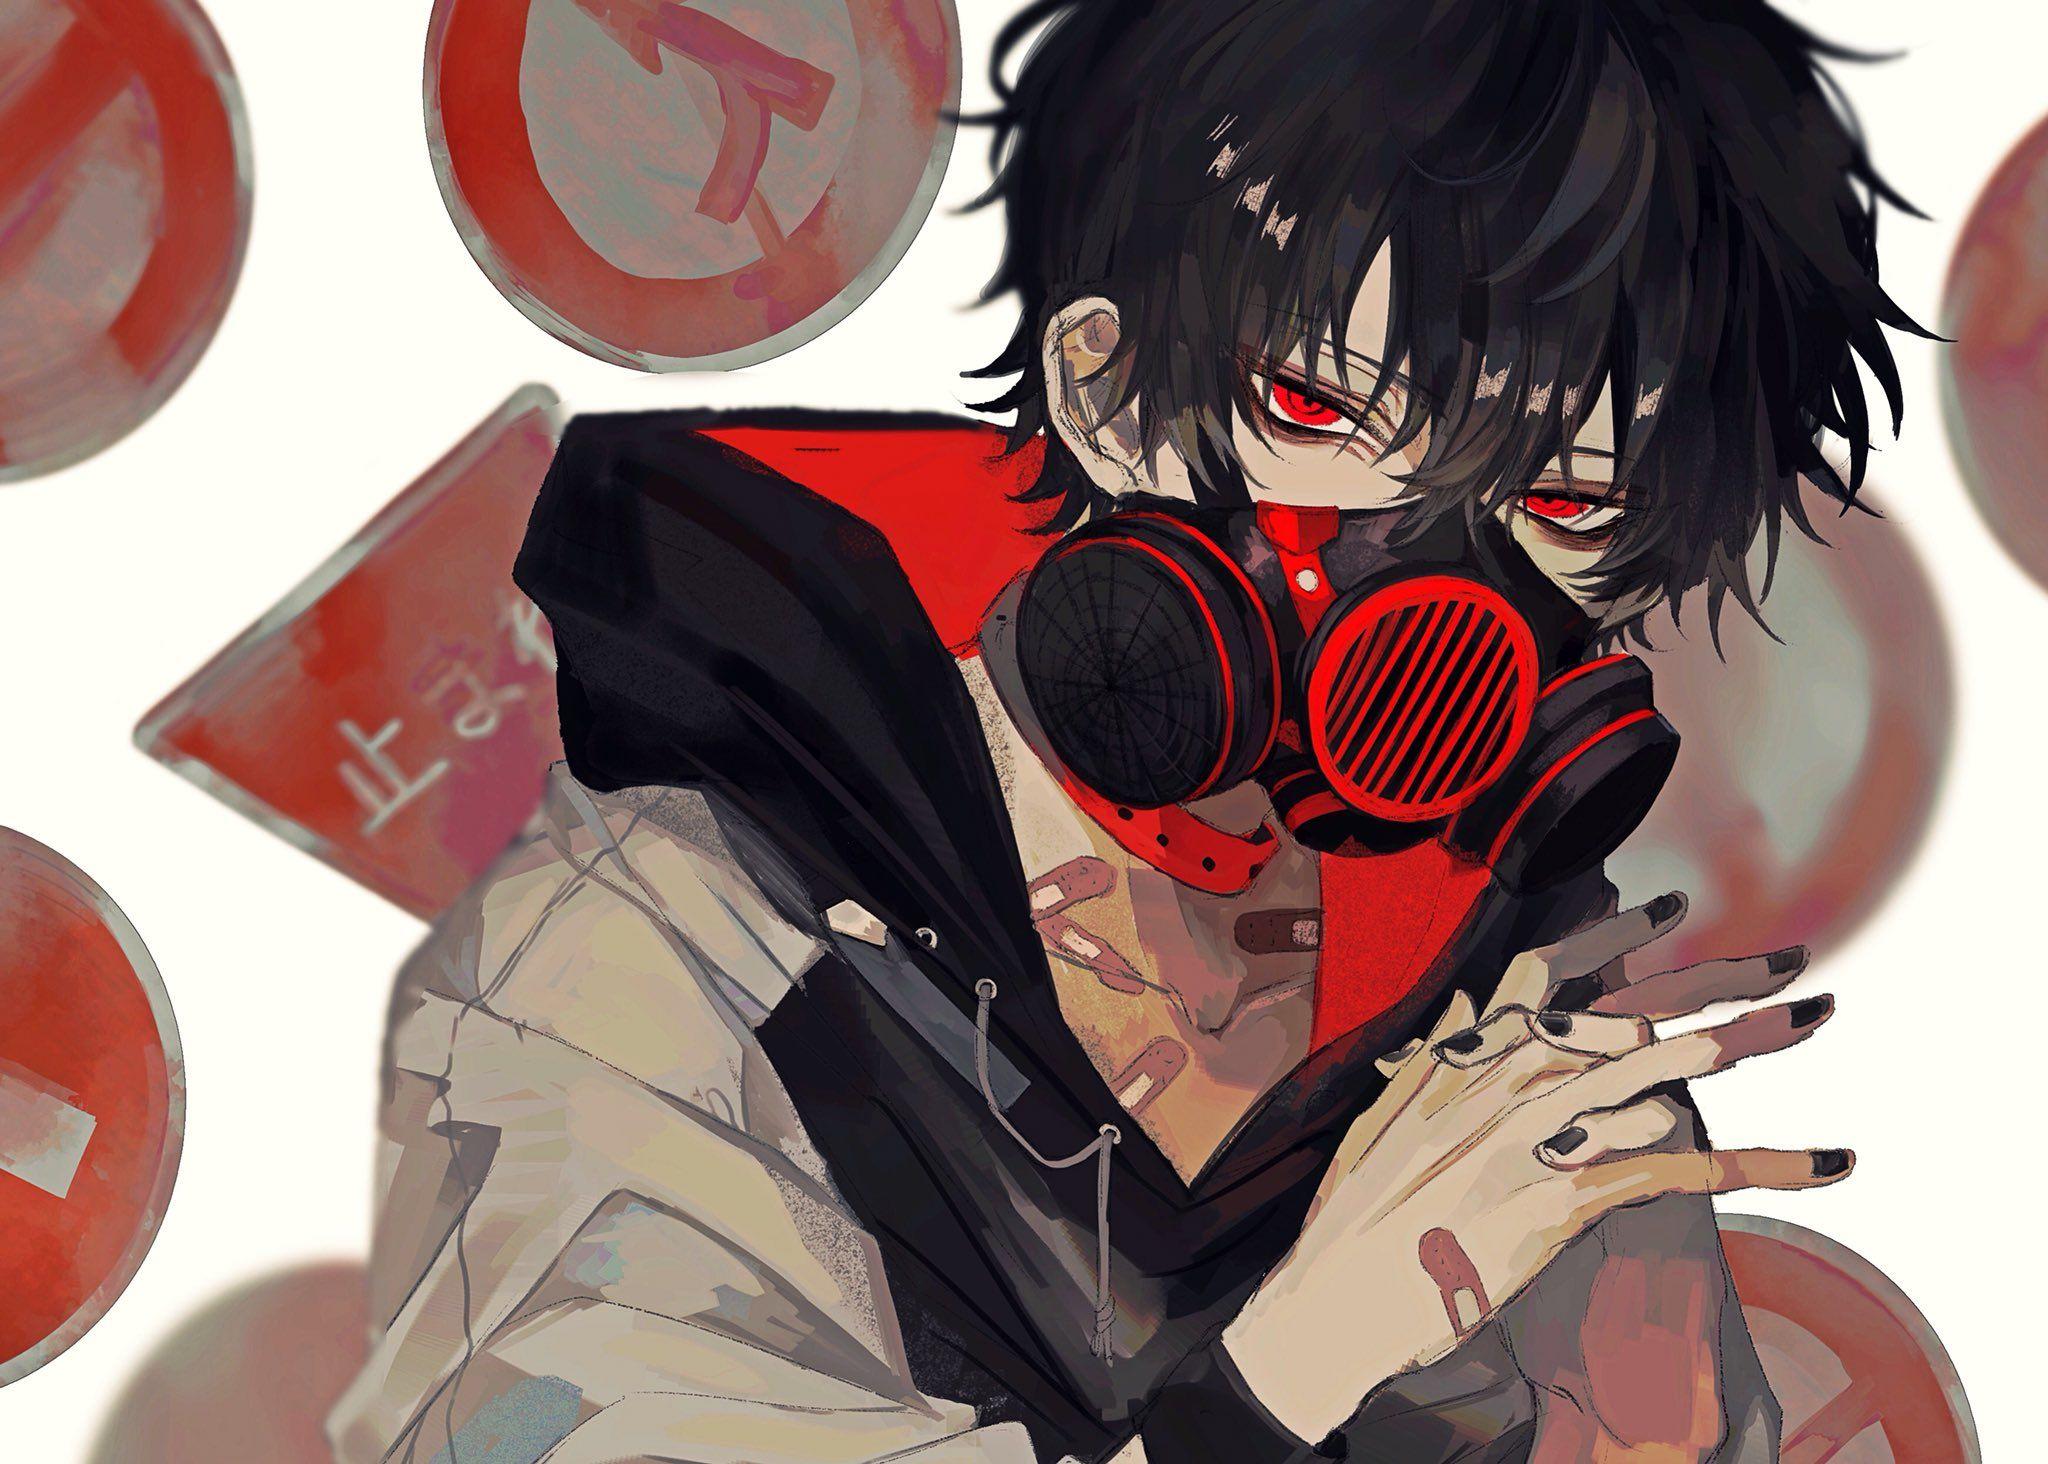 Red Eyes Road Sign Gas Masks Hoods Bandage Black Hair Black Nails Collar Male Anime Wallpaper No 768234 Anime Gas Mask Anime Boy Anime